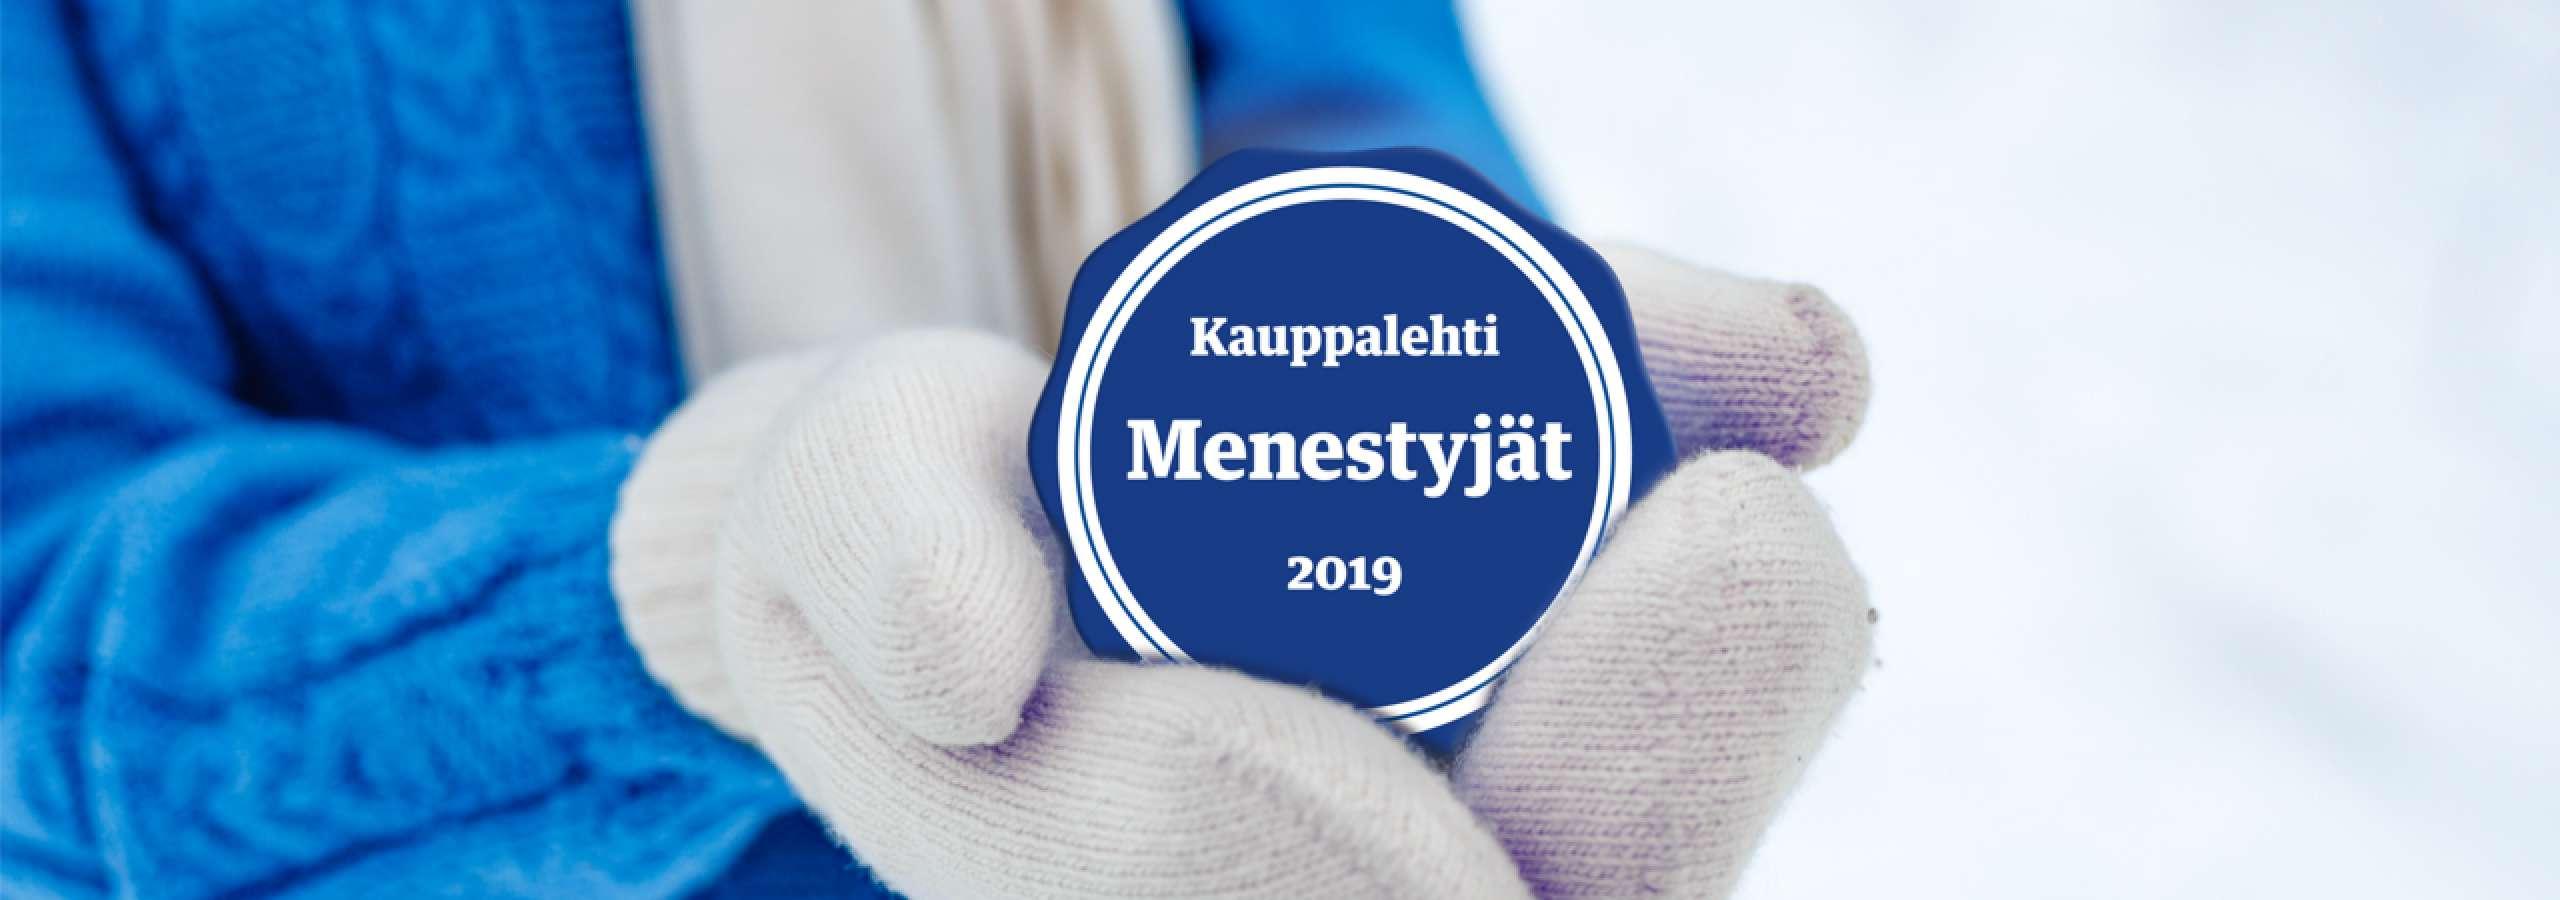 Teknoware awarded the Kauppalehti Achievers certificate again